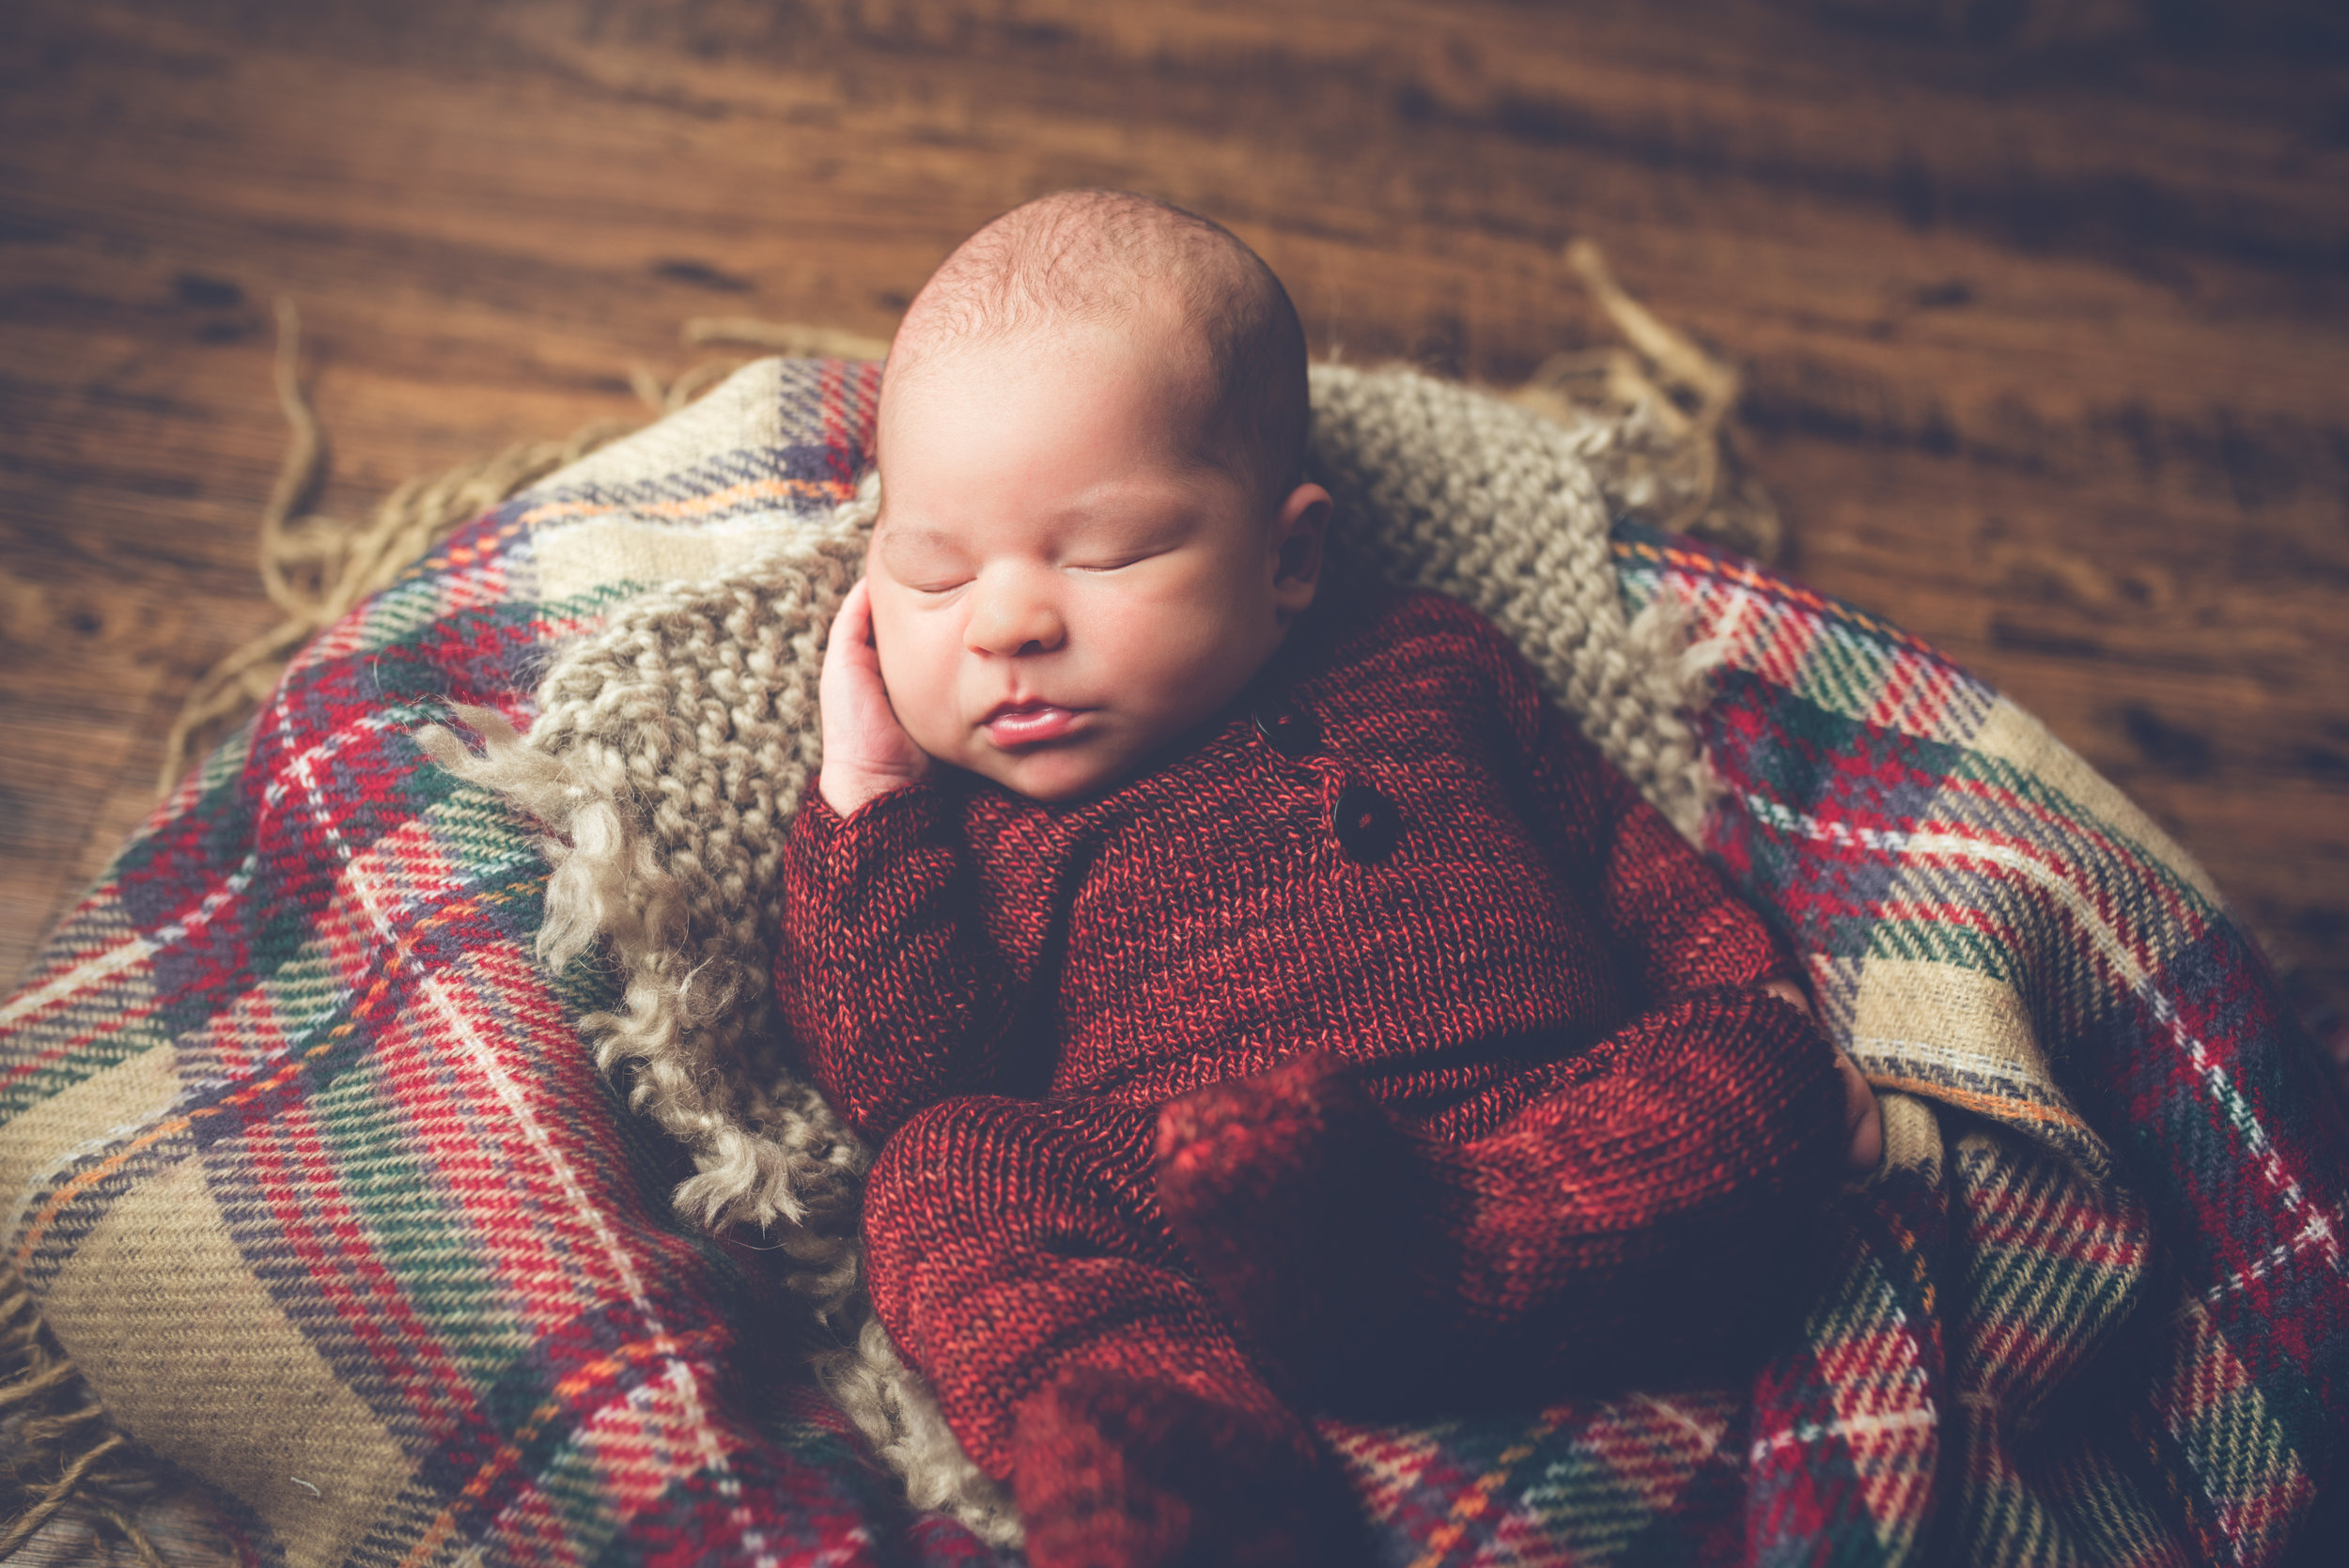 Newborn_Isaac_9Days-2.jpg